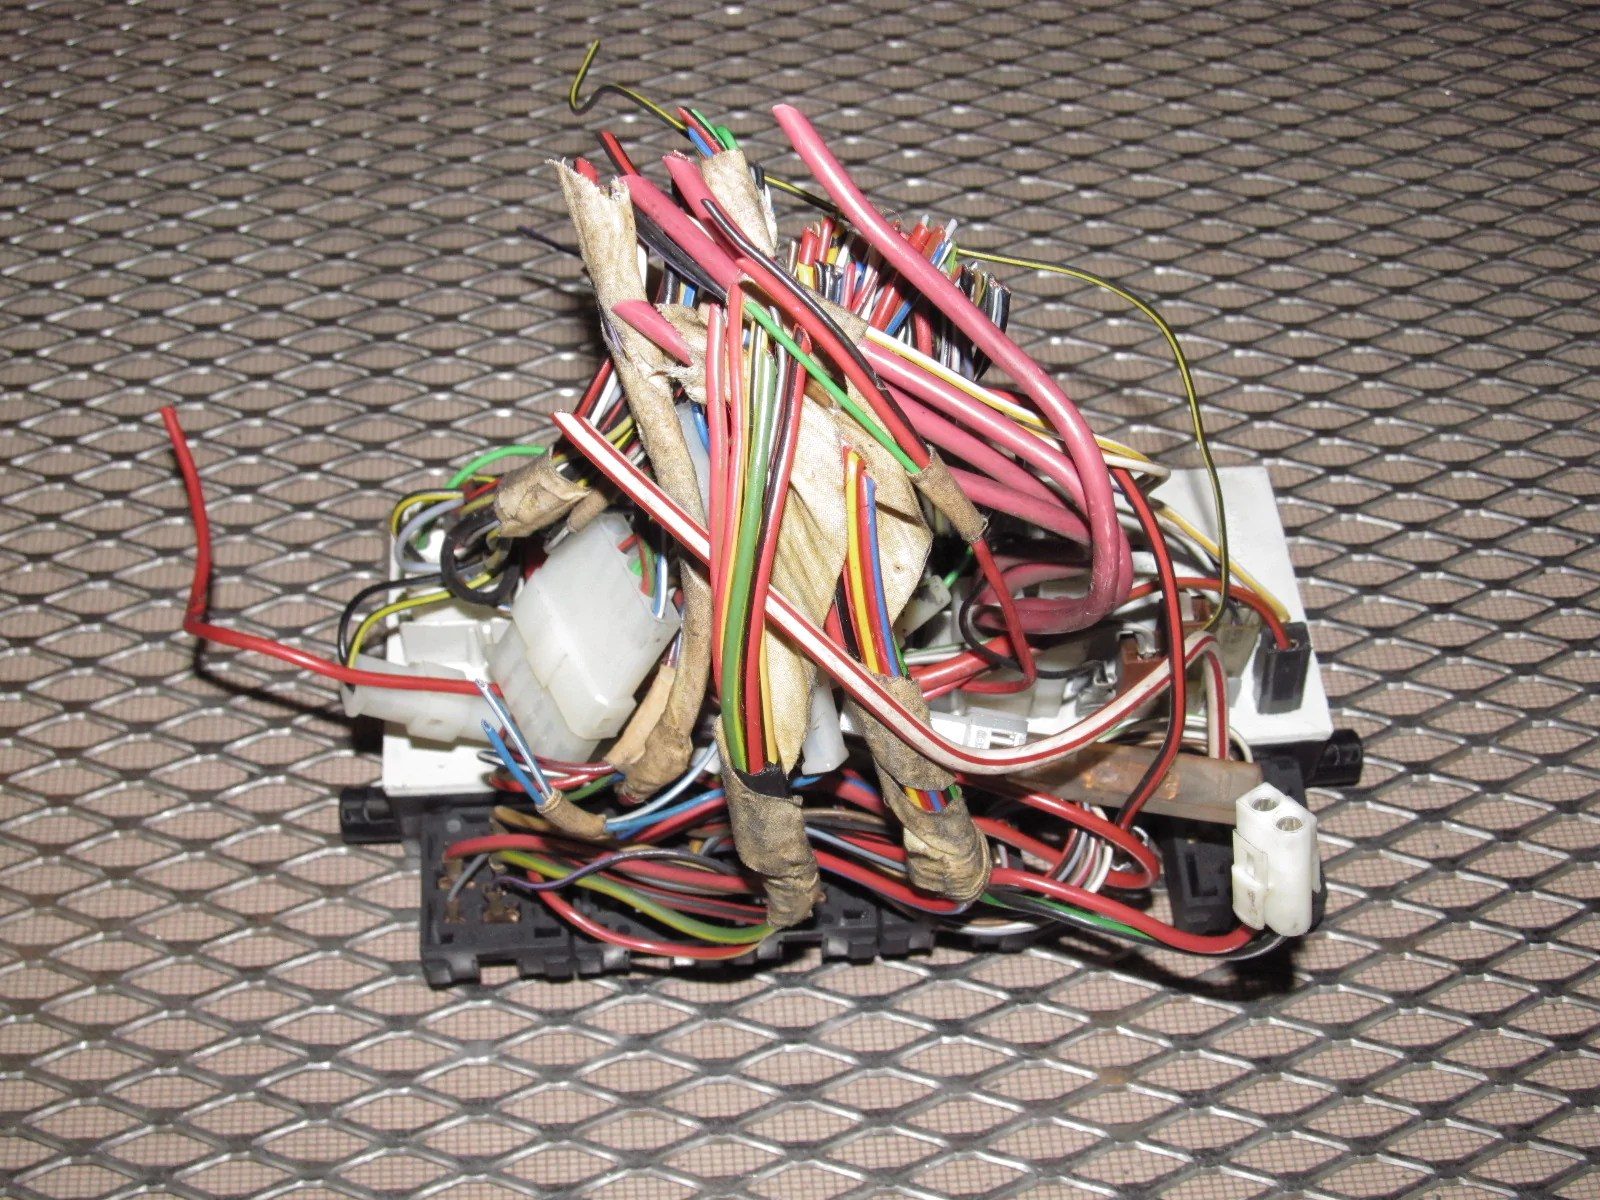 85 porsche fuse box u2022 wiring diagram for free 1983 porsche 944 dme relay porsche 911 [ 1600 x 1200 Pixel ]